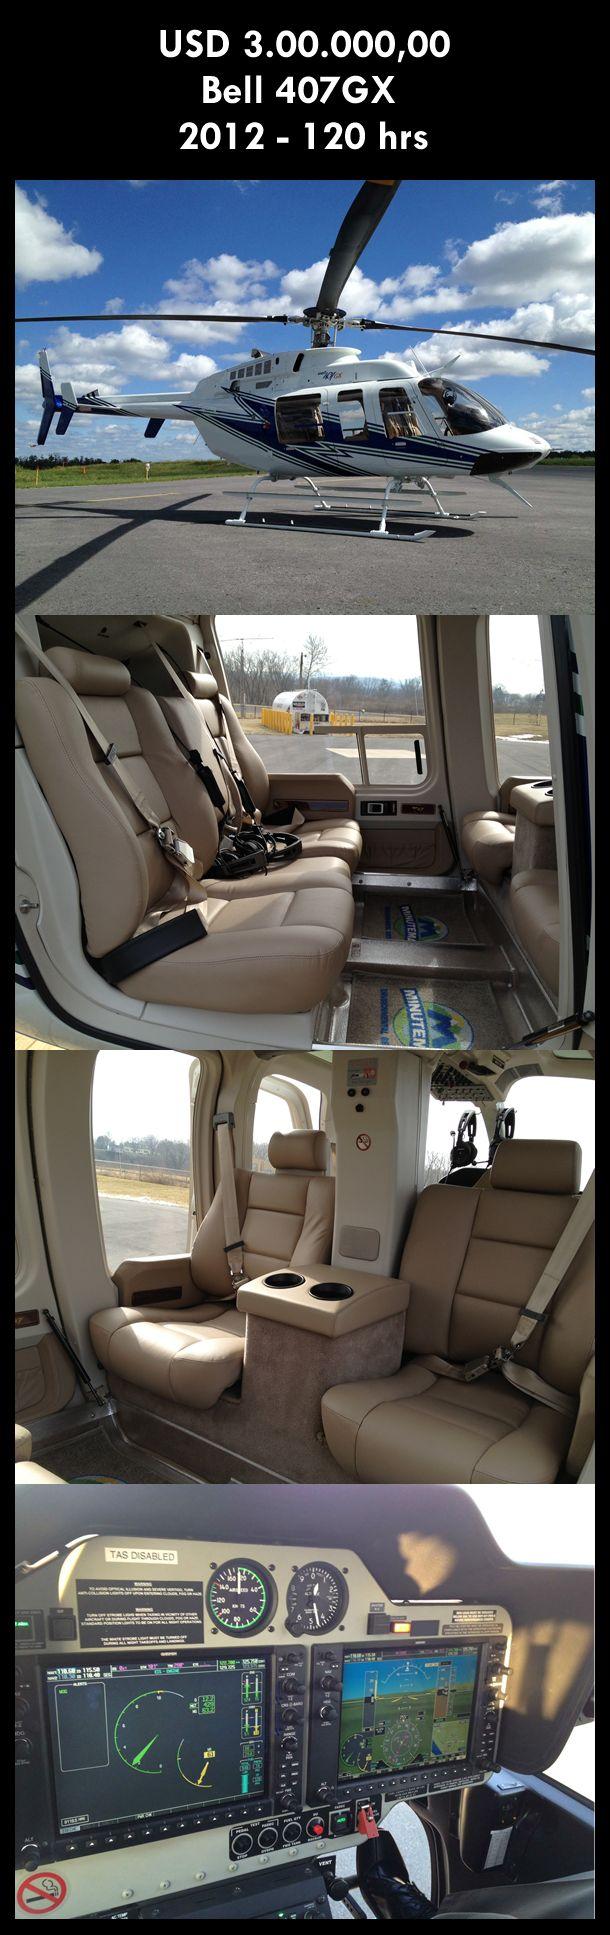 Aeronave à venda: Bell 407 GX , 2012, 120 hrs, USD 3.000.000,00. #bell #bell407 #bell407gx #bellgx #407 #airsoftanv #aircraftforsale #aeronaveavenda #pilot #piloto #helicoptero #aviation #aviacao #heli #helicopterforsale  www.airsoftaeronaves.com.br/H224